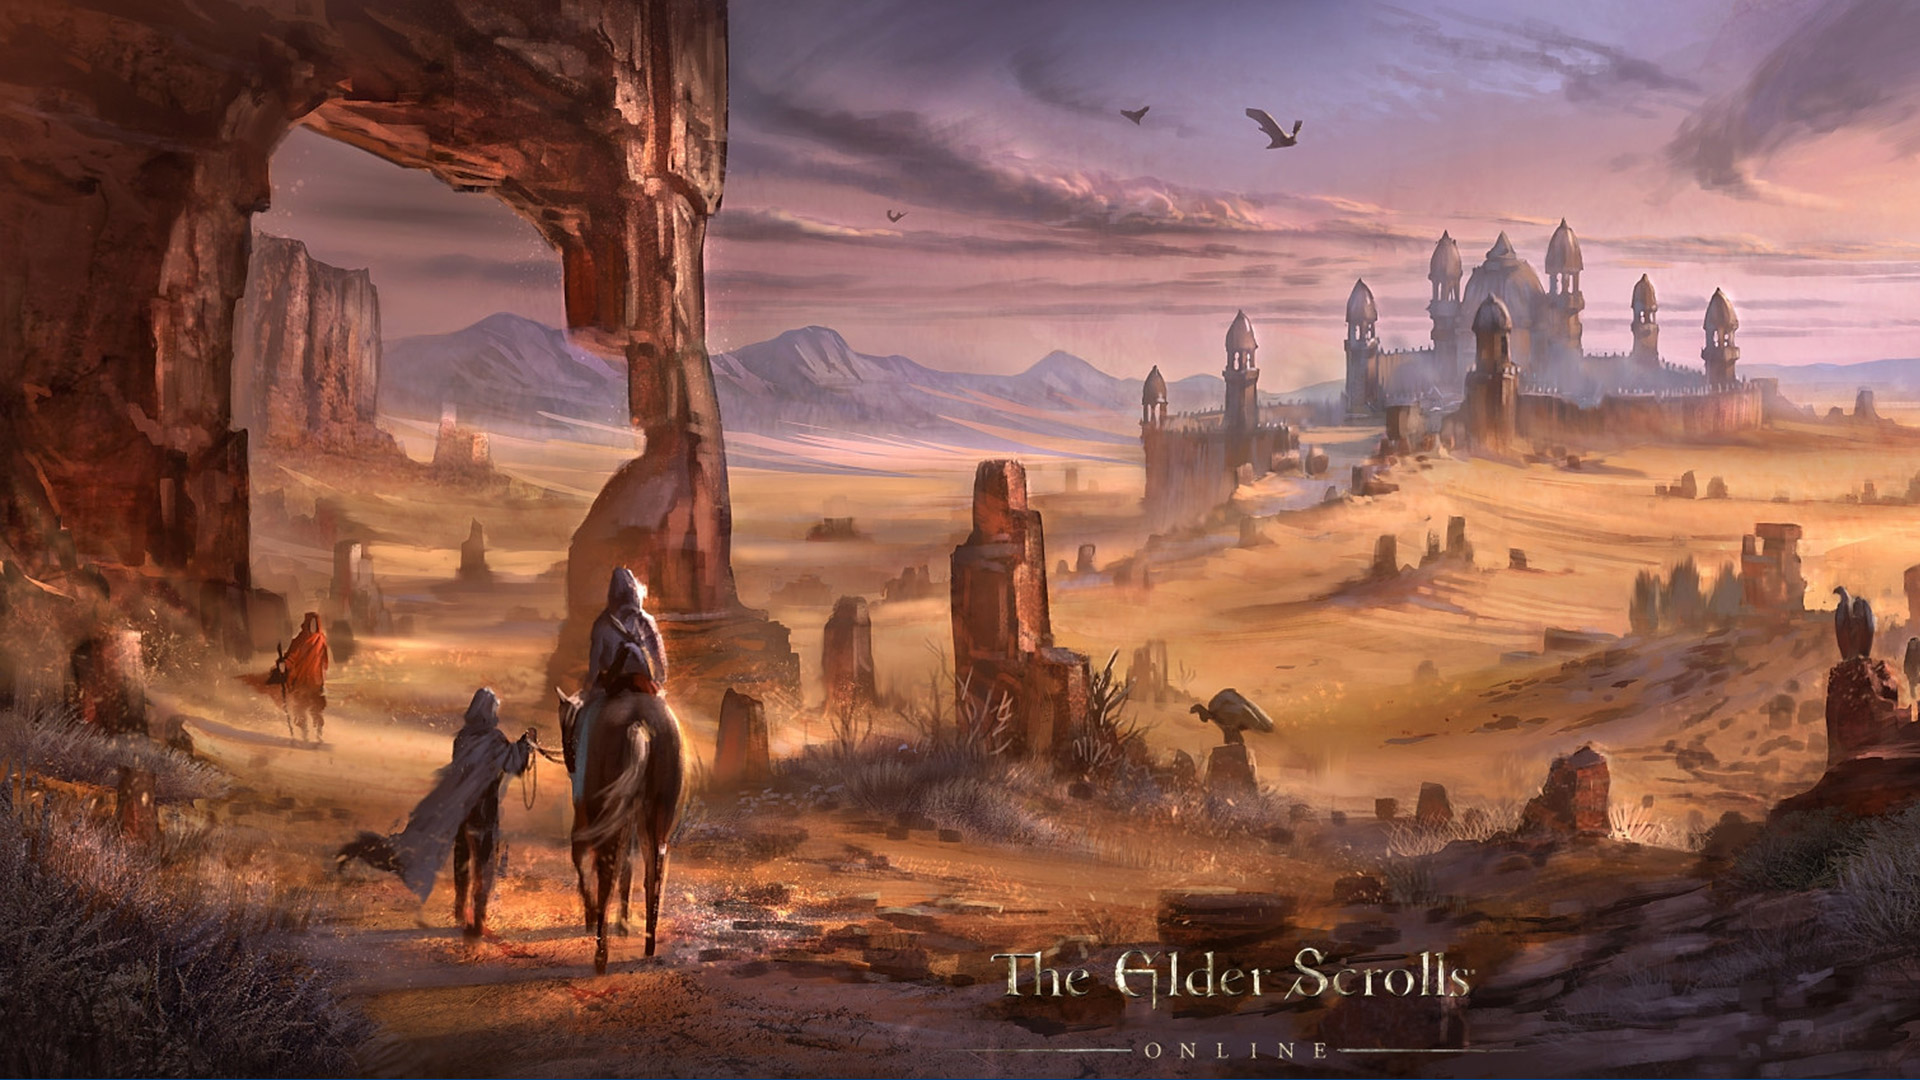 The Elder Scrolls Online wallpaper 2